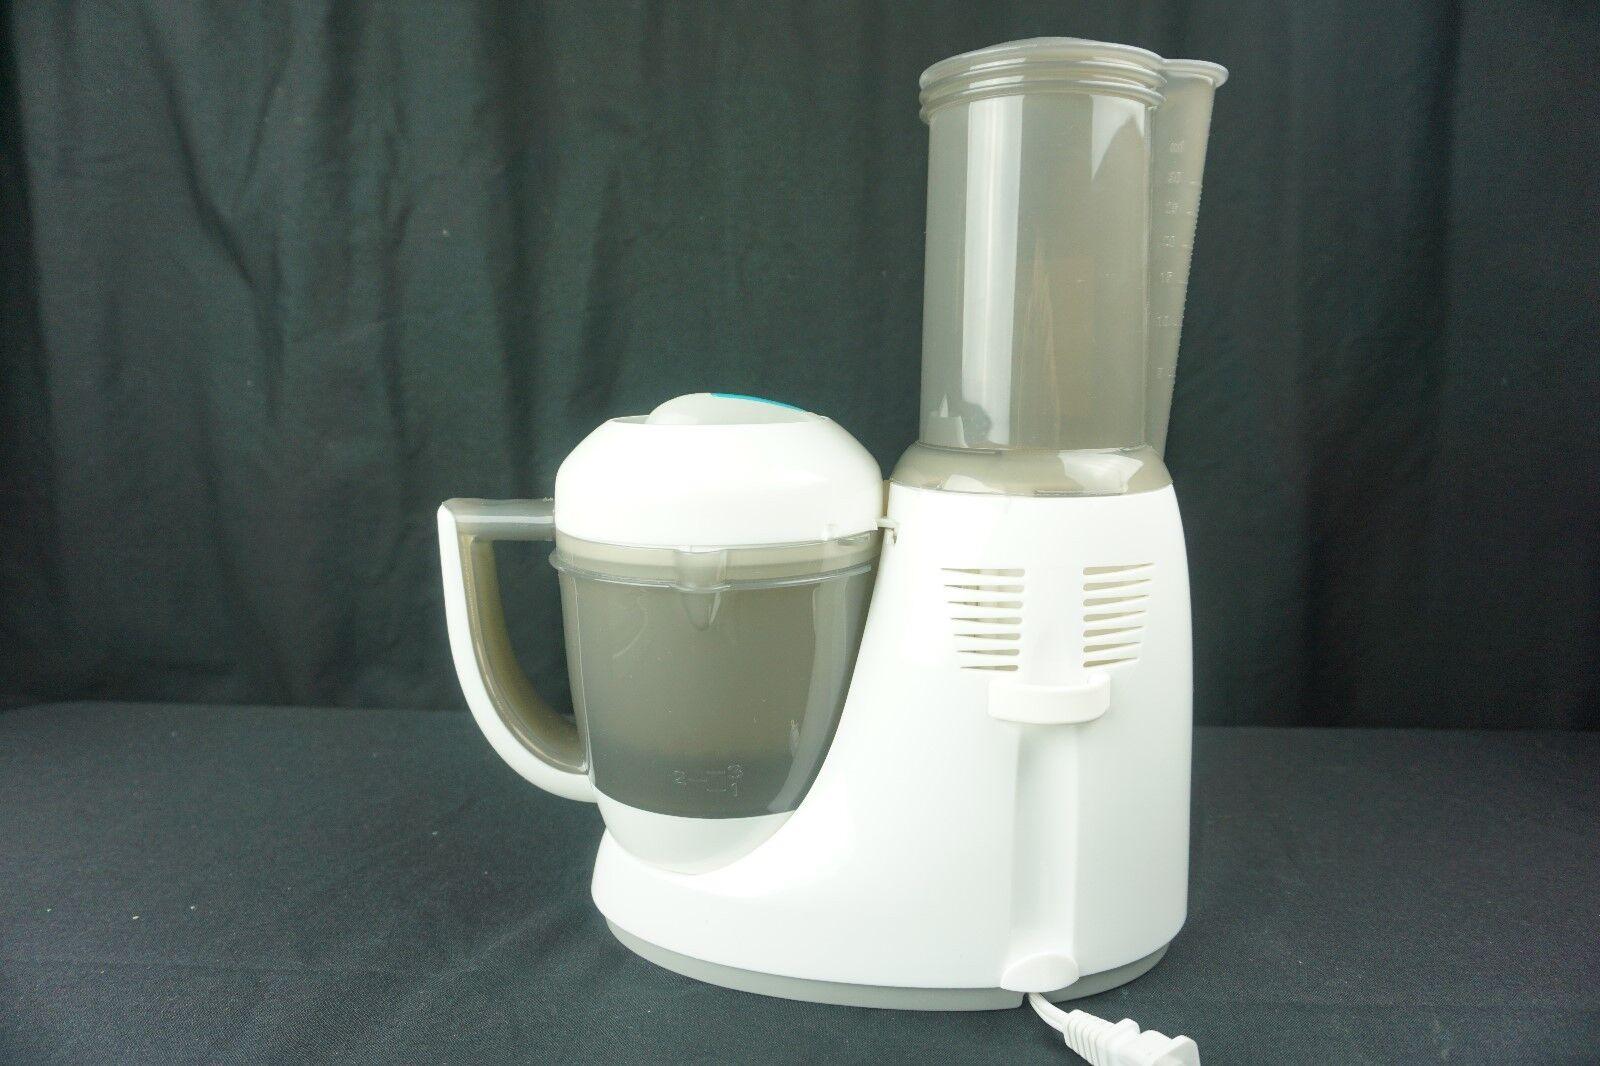 Harga Jual Feeding Terbaru 2018 Beaba Babycook Duo Plus Grey Original 6 In 1 Steam Cooker Blender And Bottle Warmer 35 Cups